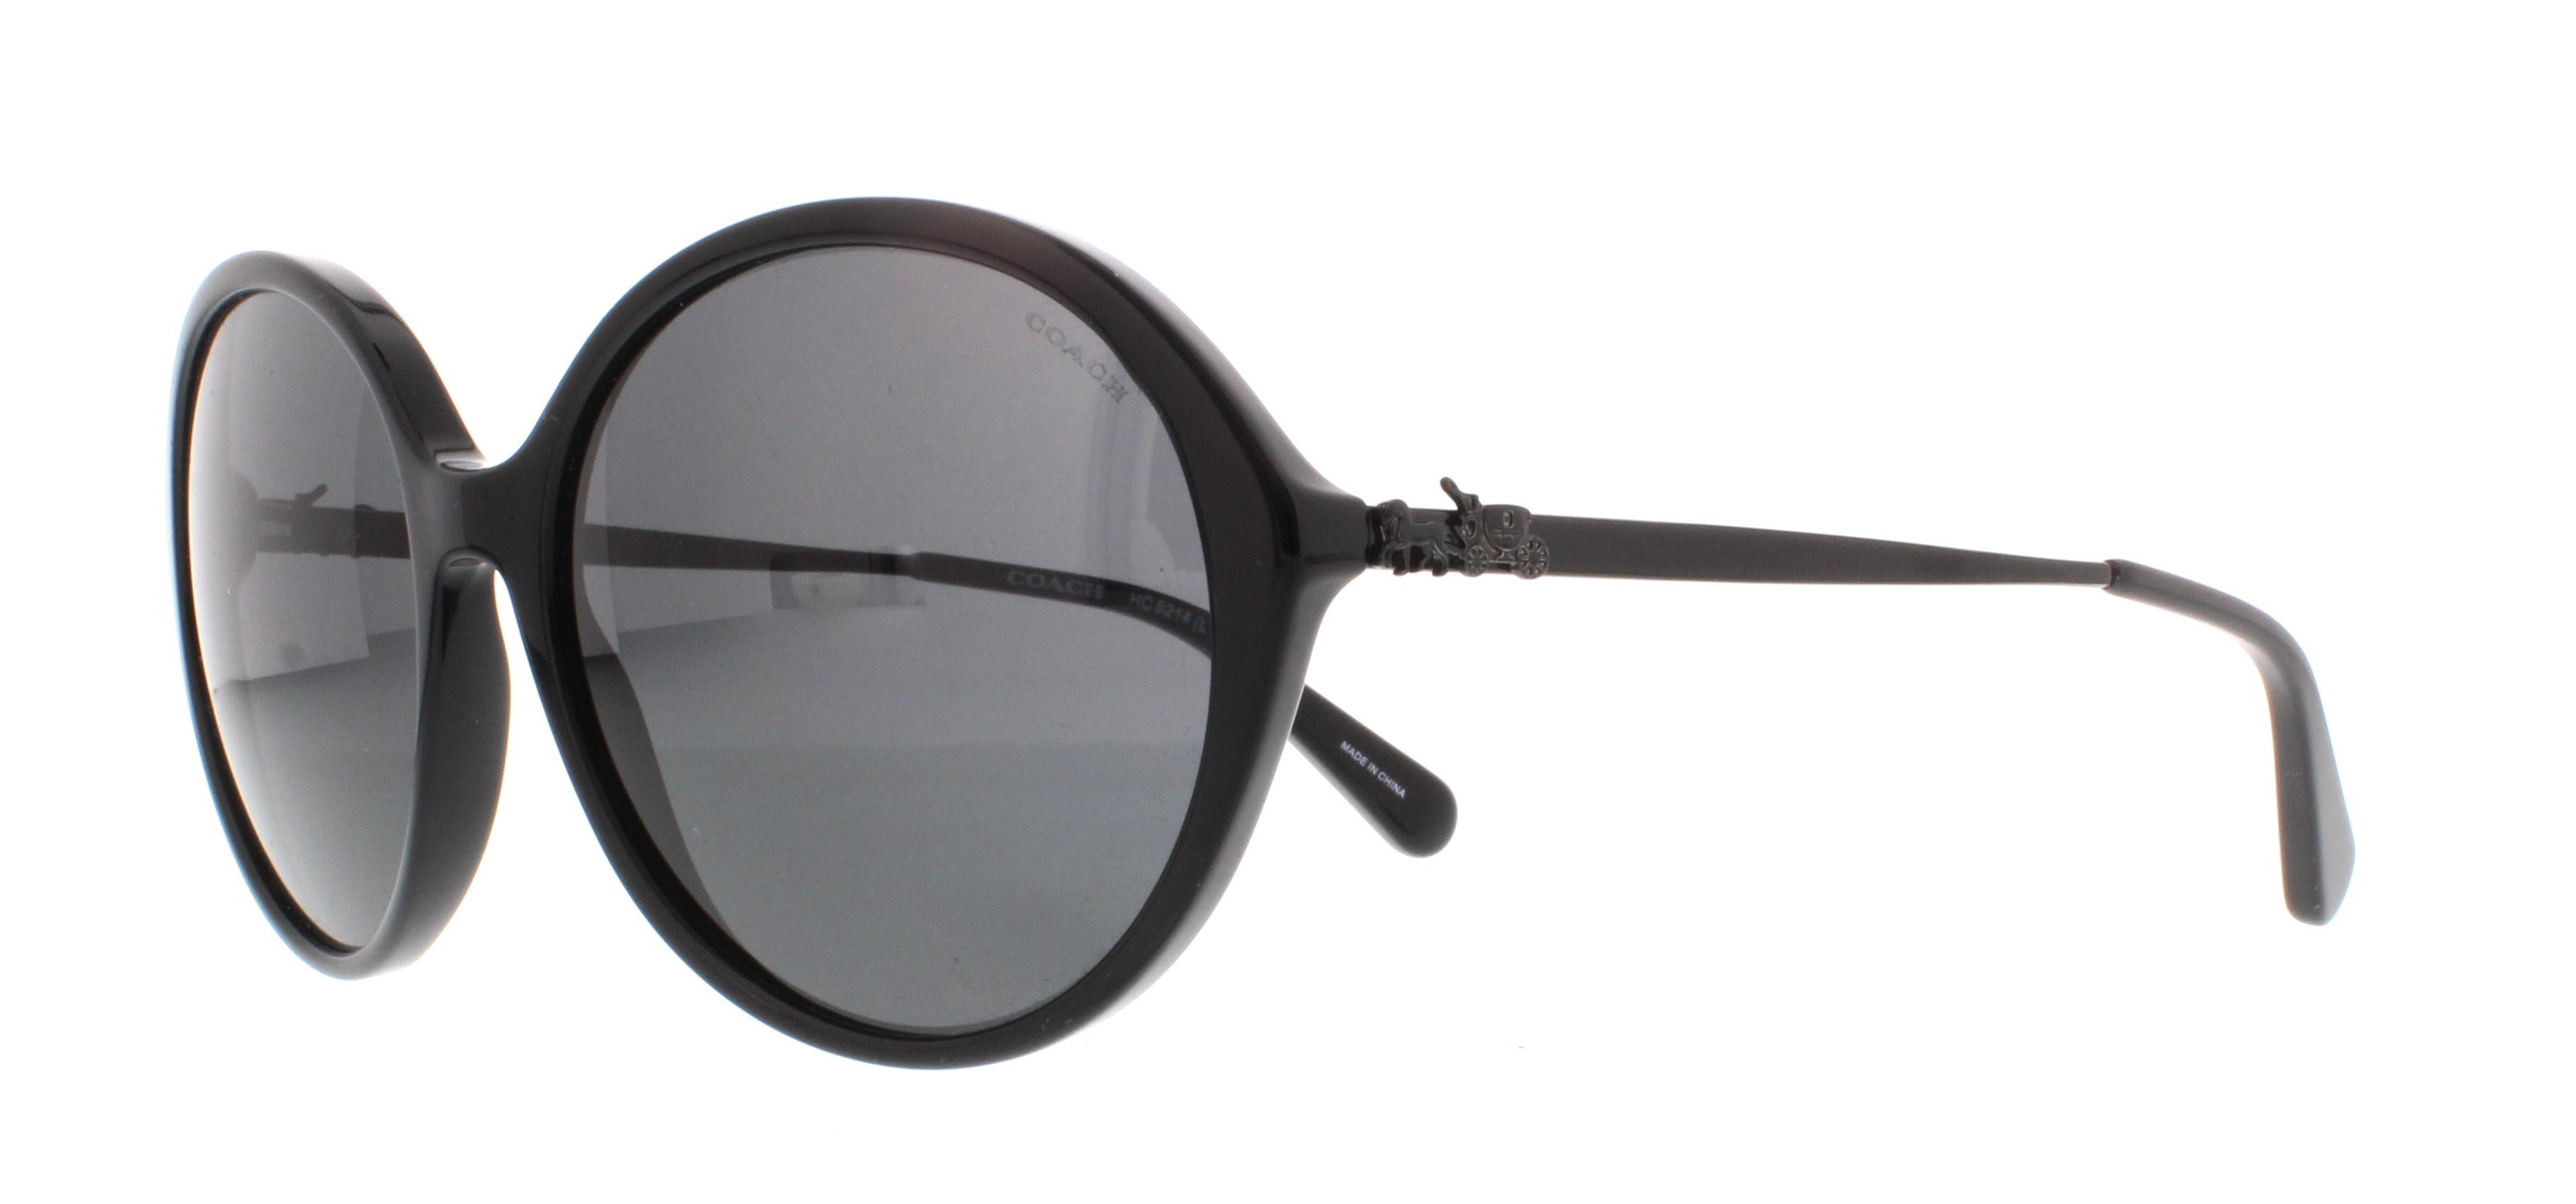 8923d441a9 ... canada coach sunglasses hc8214 548287 black 56mm 5597e 4b5dd